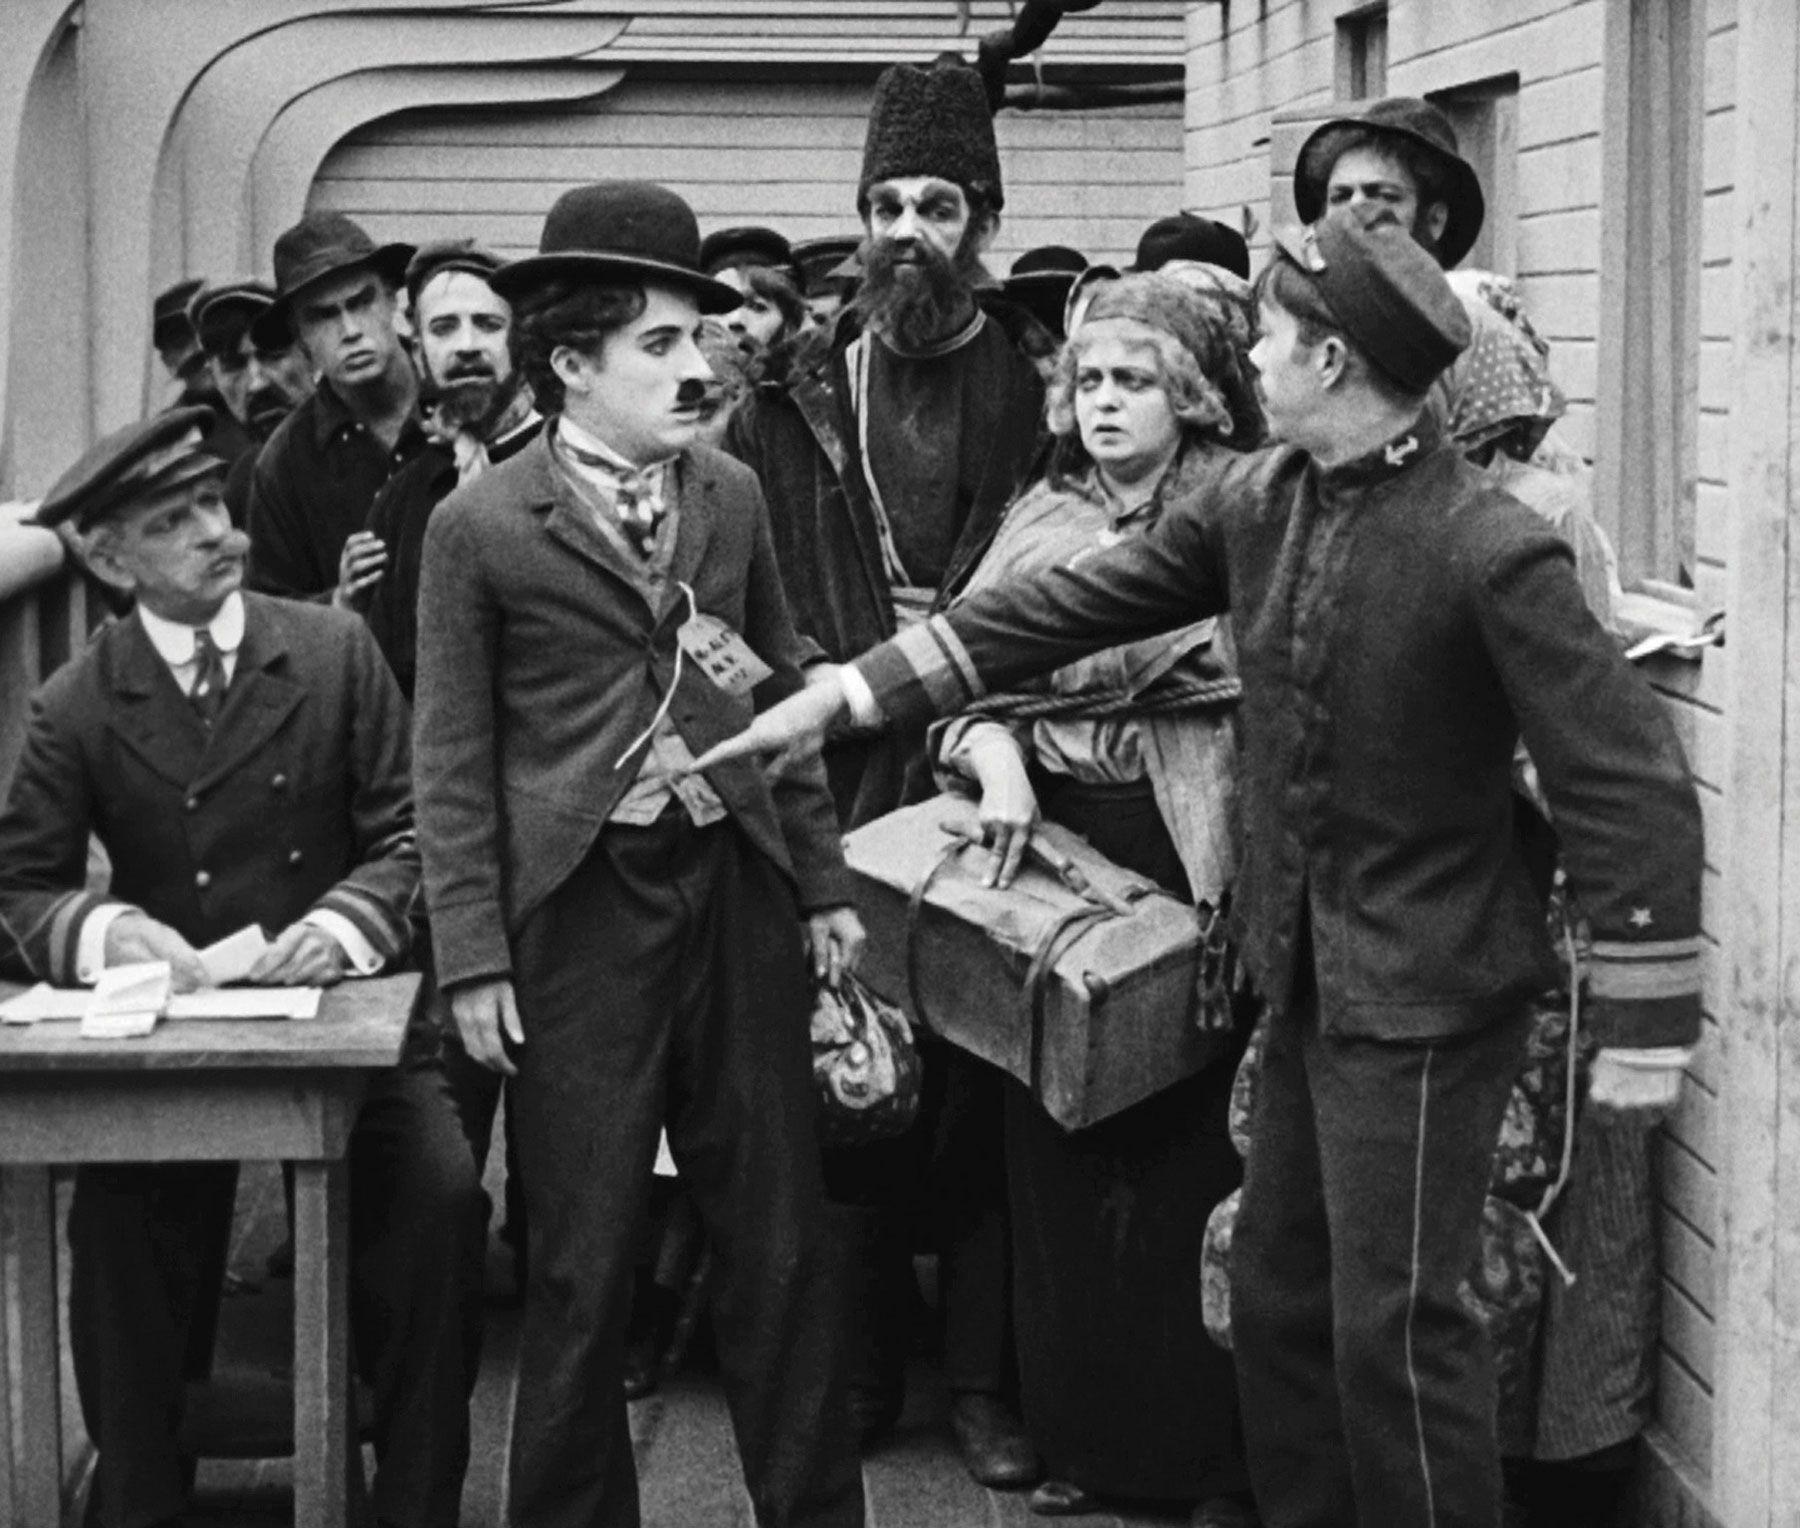 7 ART CINEMA Charlie chaplin, Silent film, Chaplin